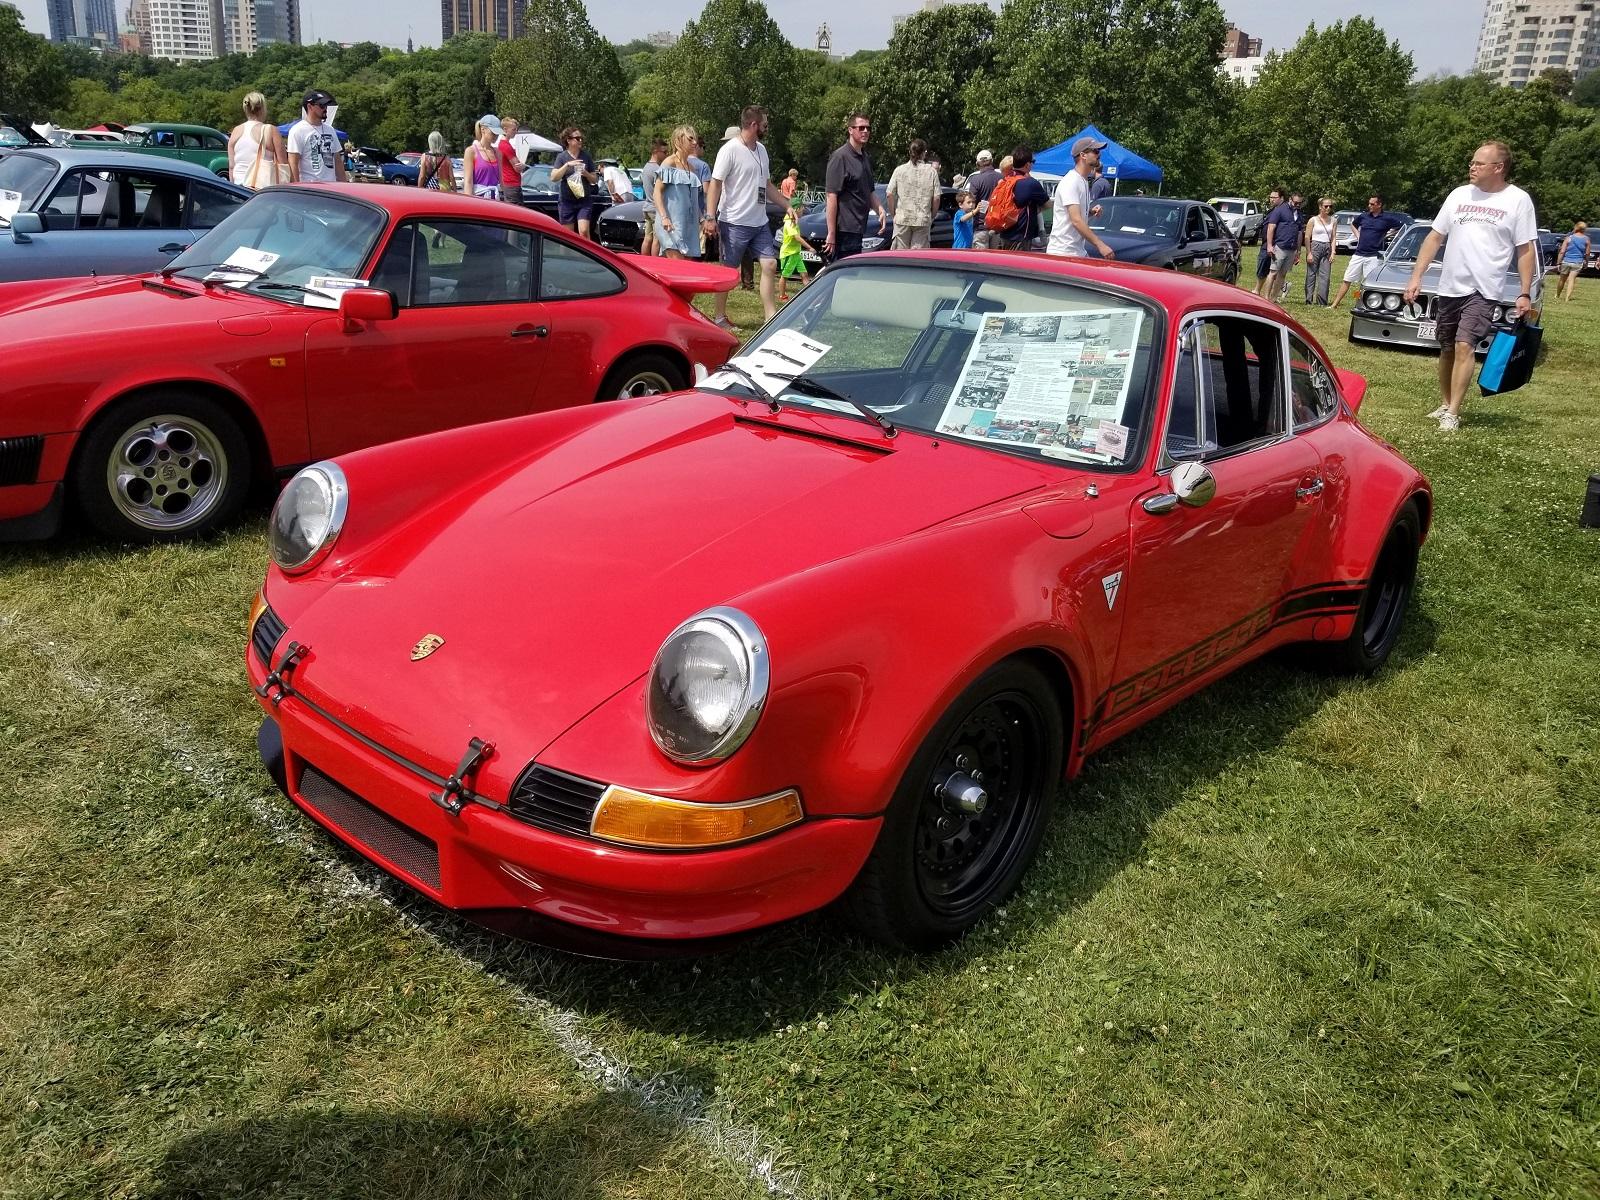 Zanimljivost dana: Najstariji Porsche 901 sa lica mesta